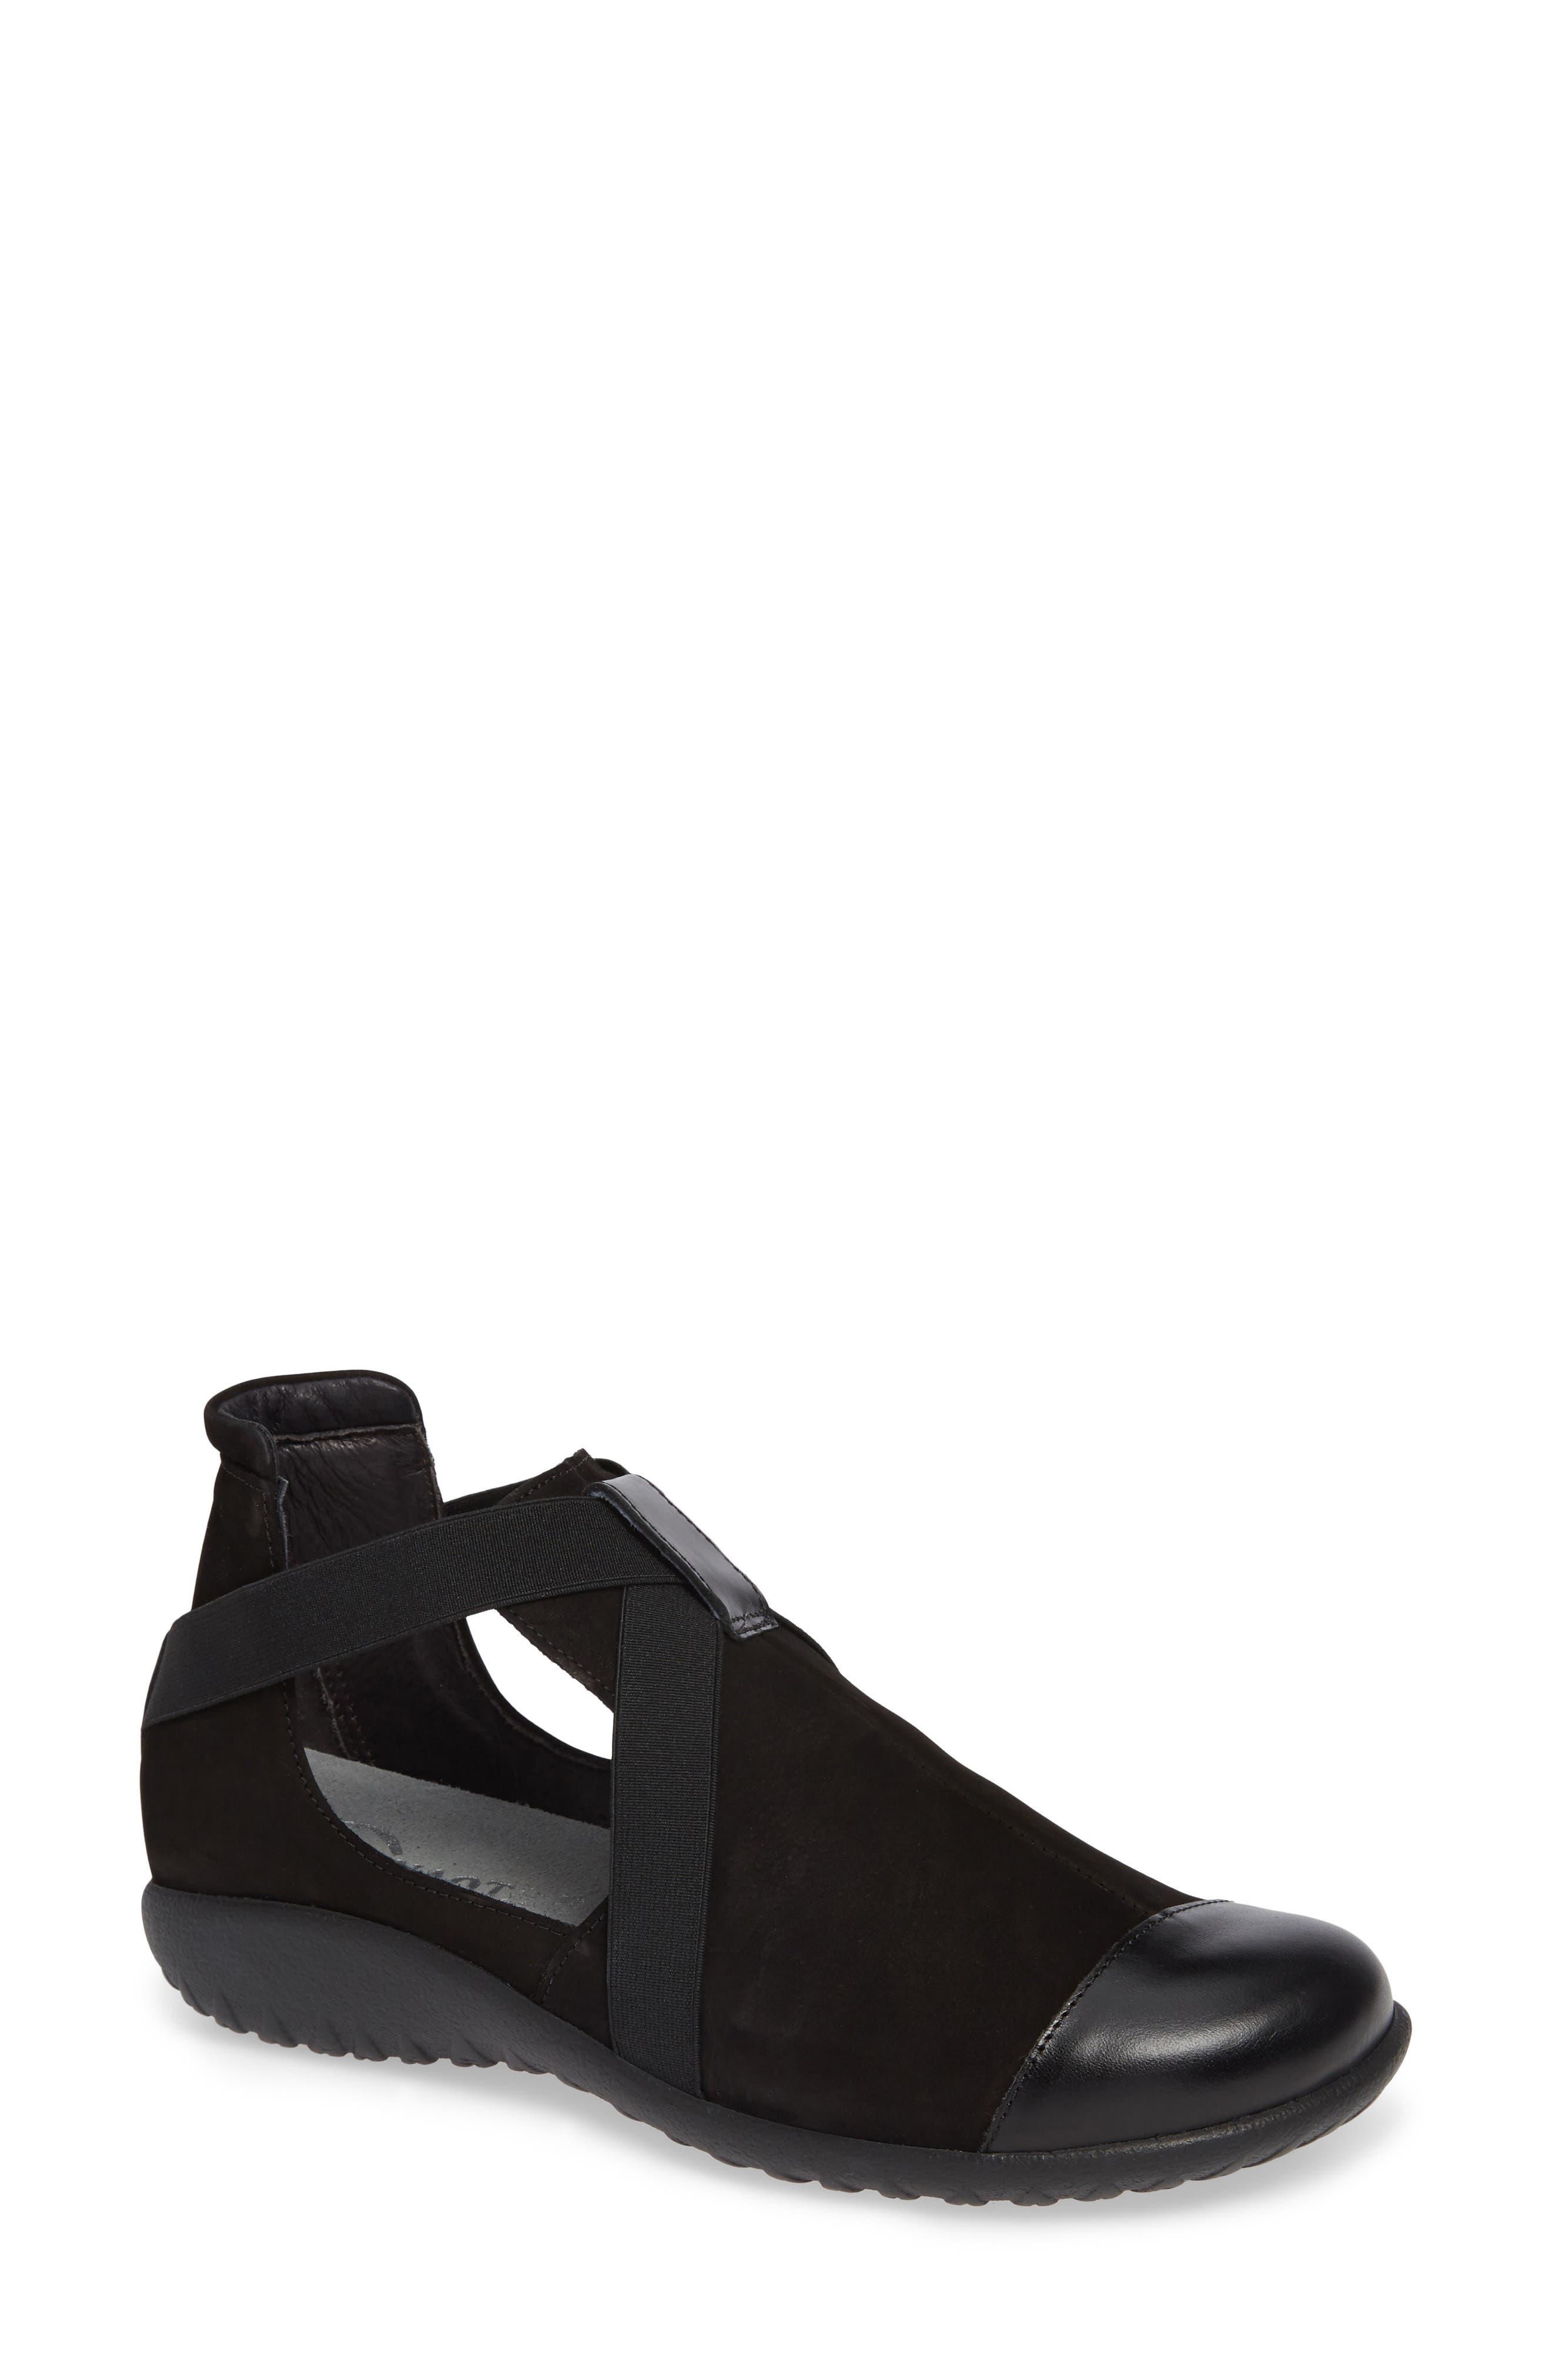 Rakua Slip On Sneaker,                         Main,                         color, BLACK NUBUCK